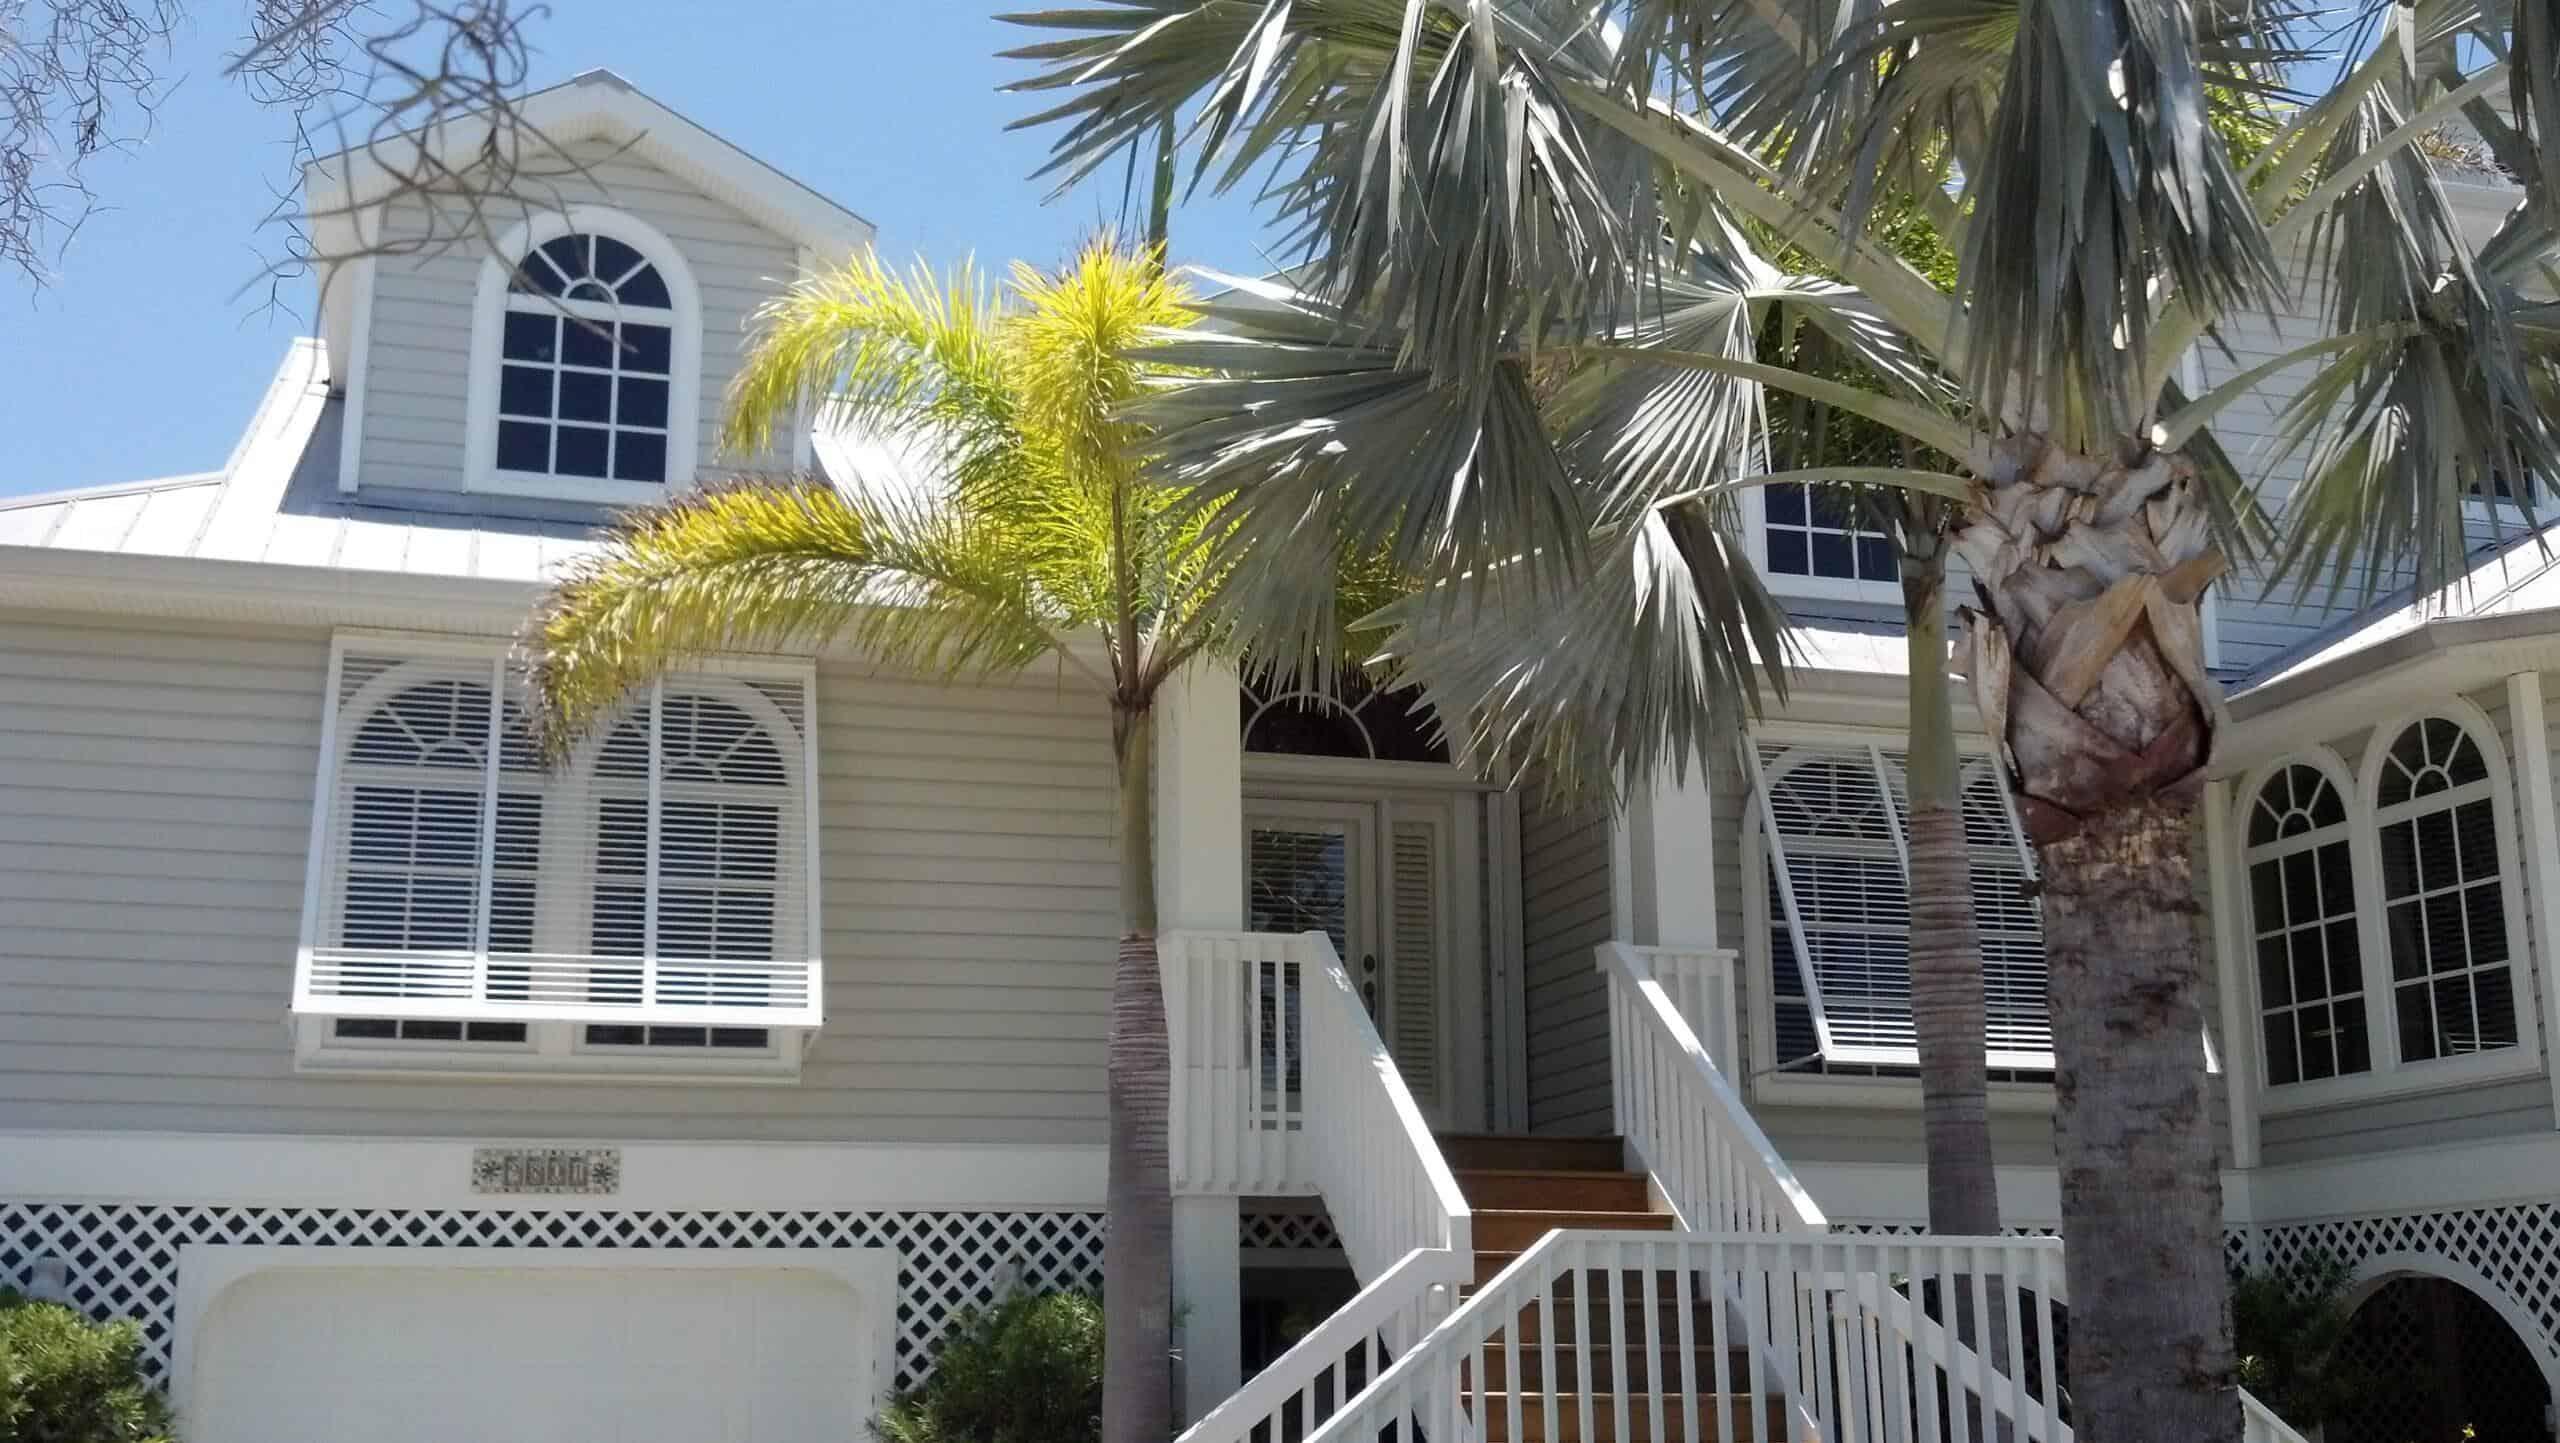 Eurex Bahama Shutters on tan house